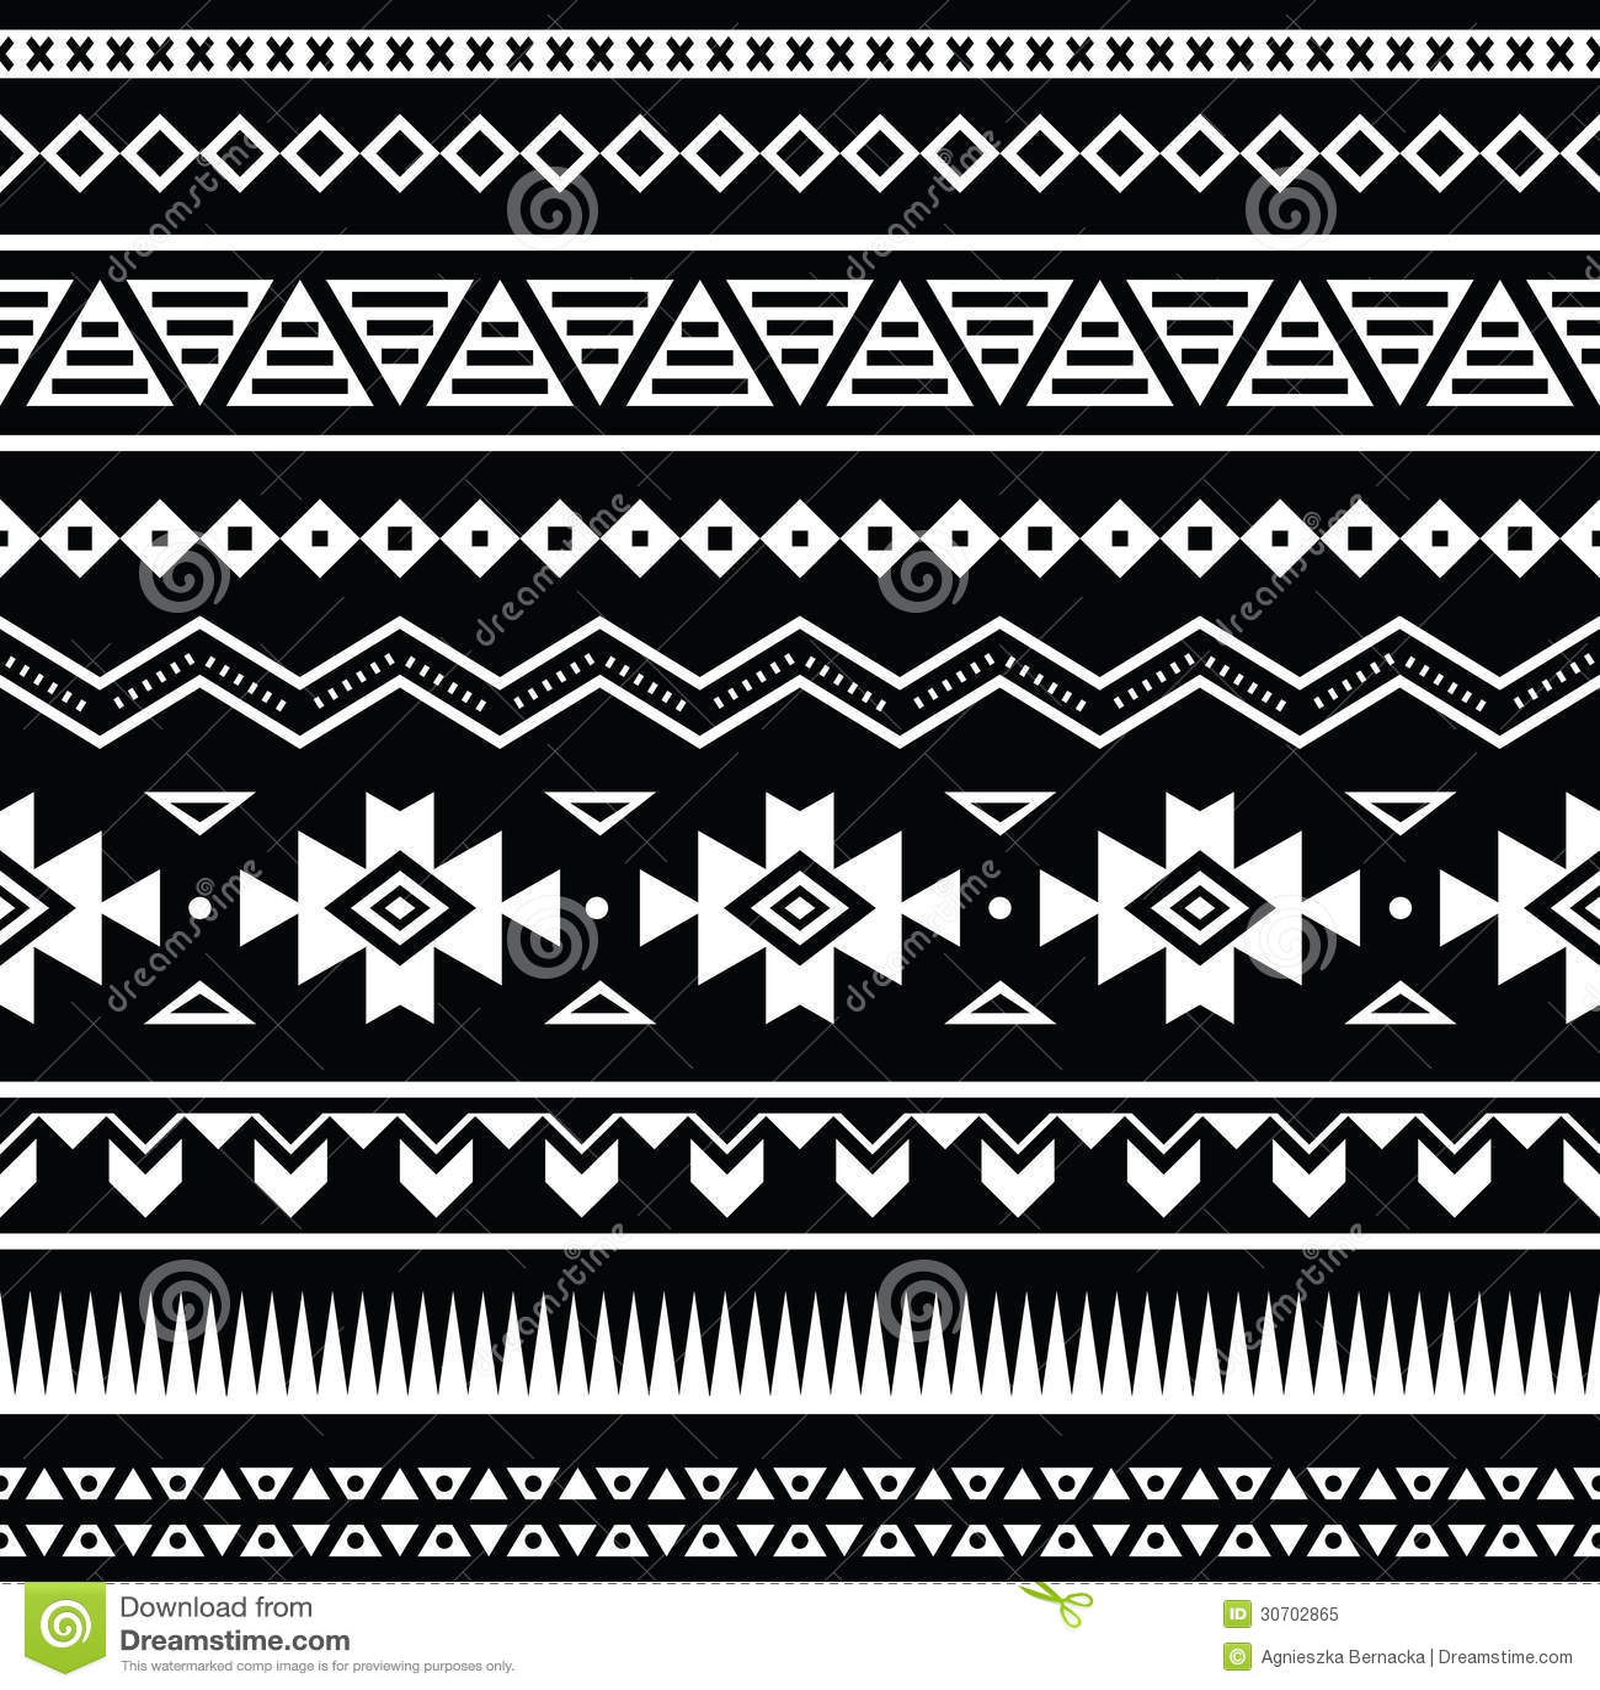 Aztec sömlös modell, stam- svartvit bakgrund